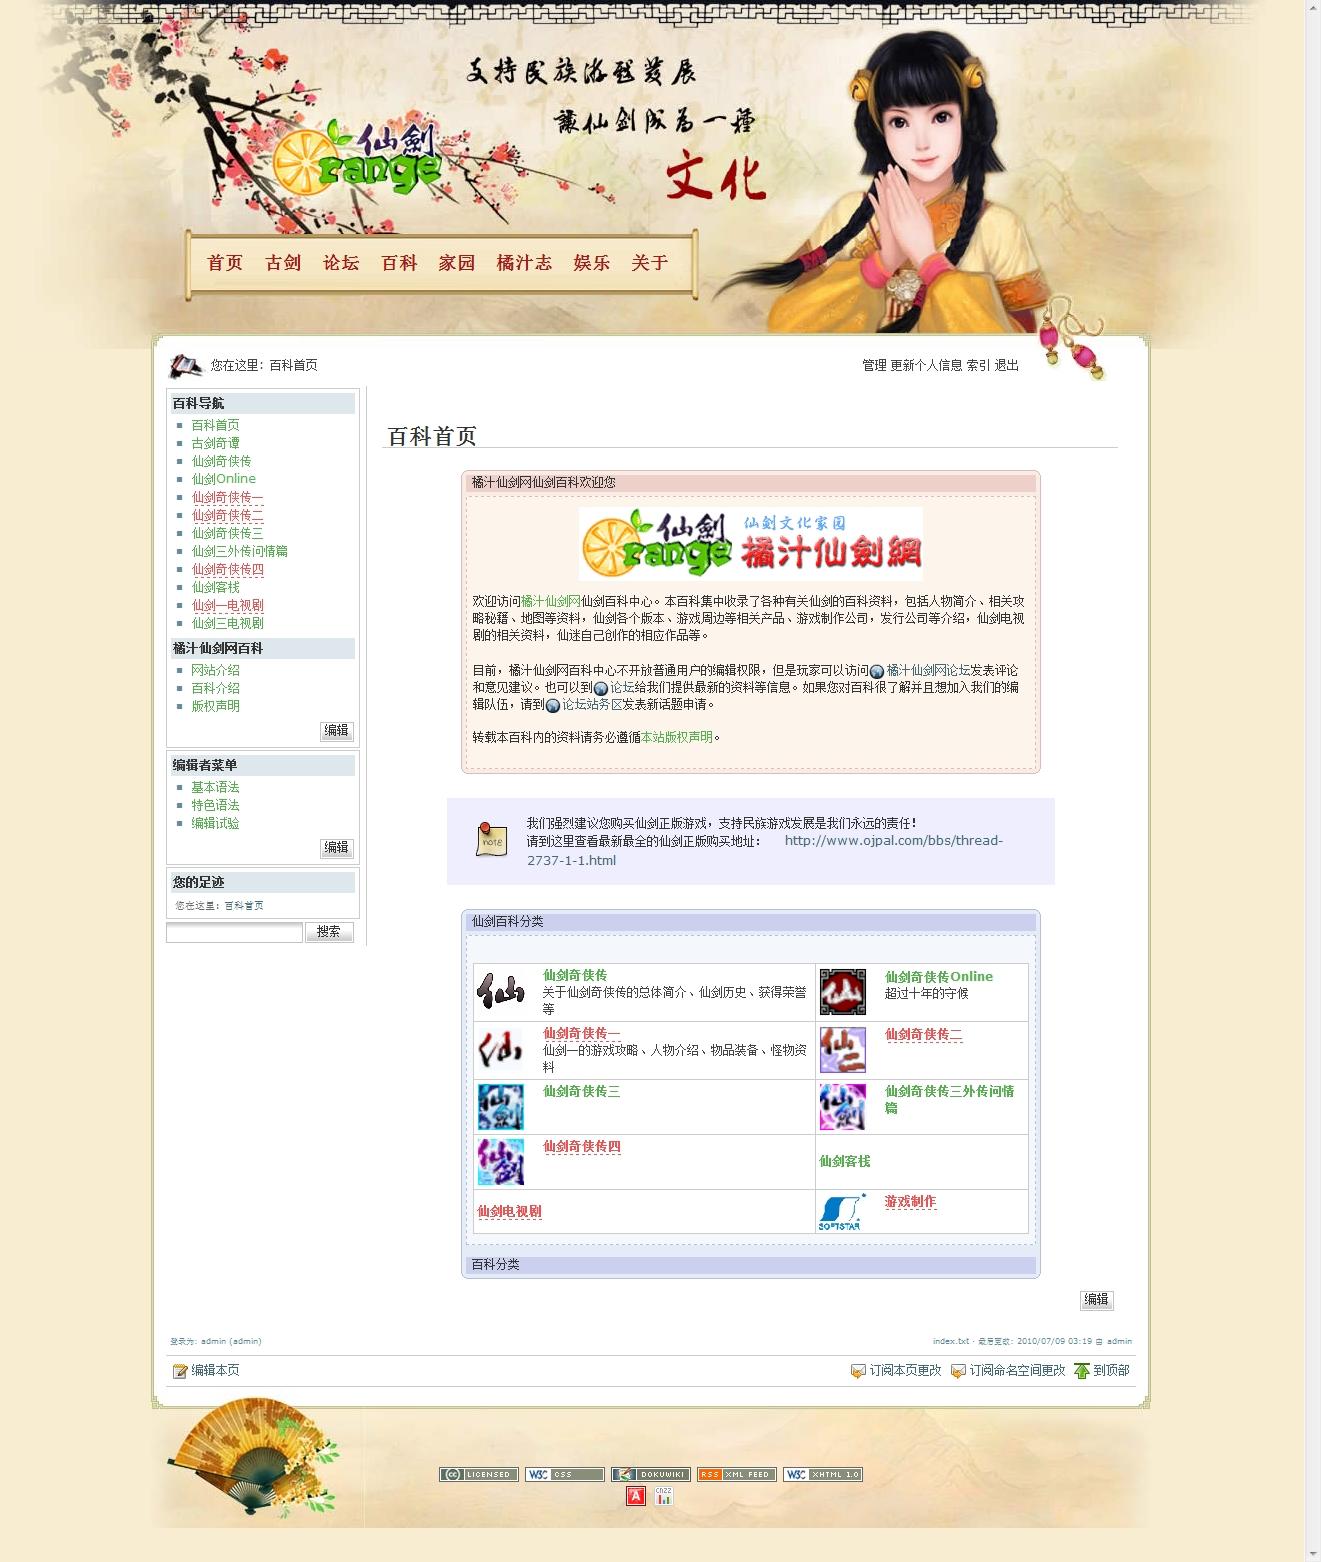 about:橘汁仙剑网百科-第二版.jpg